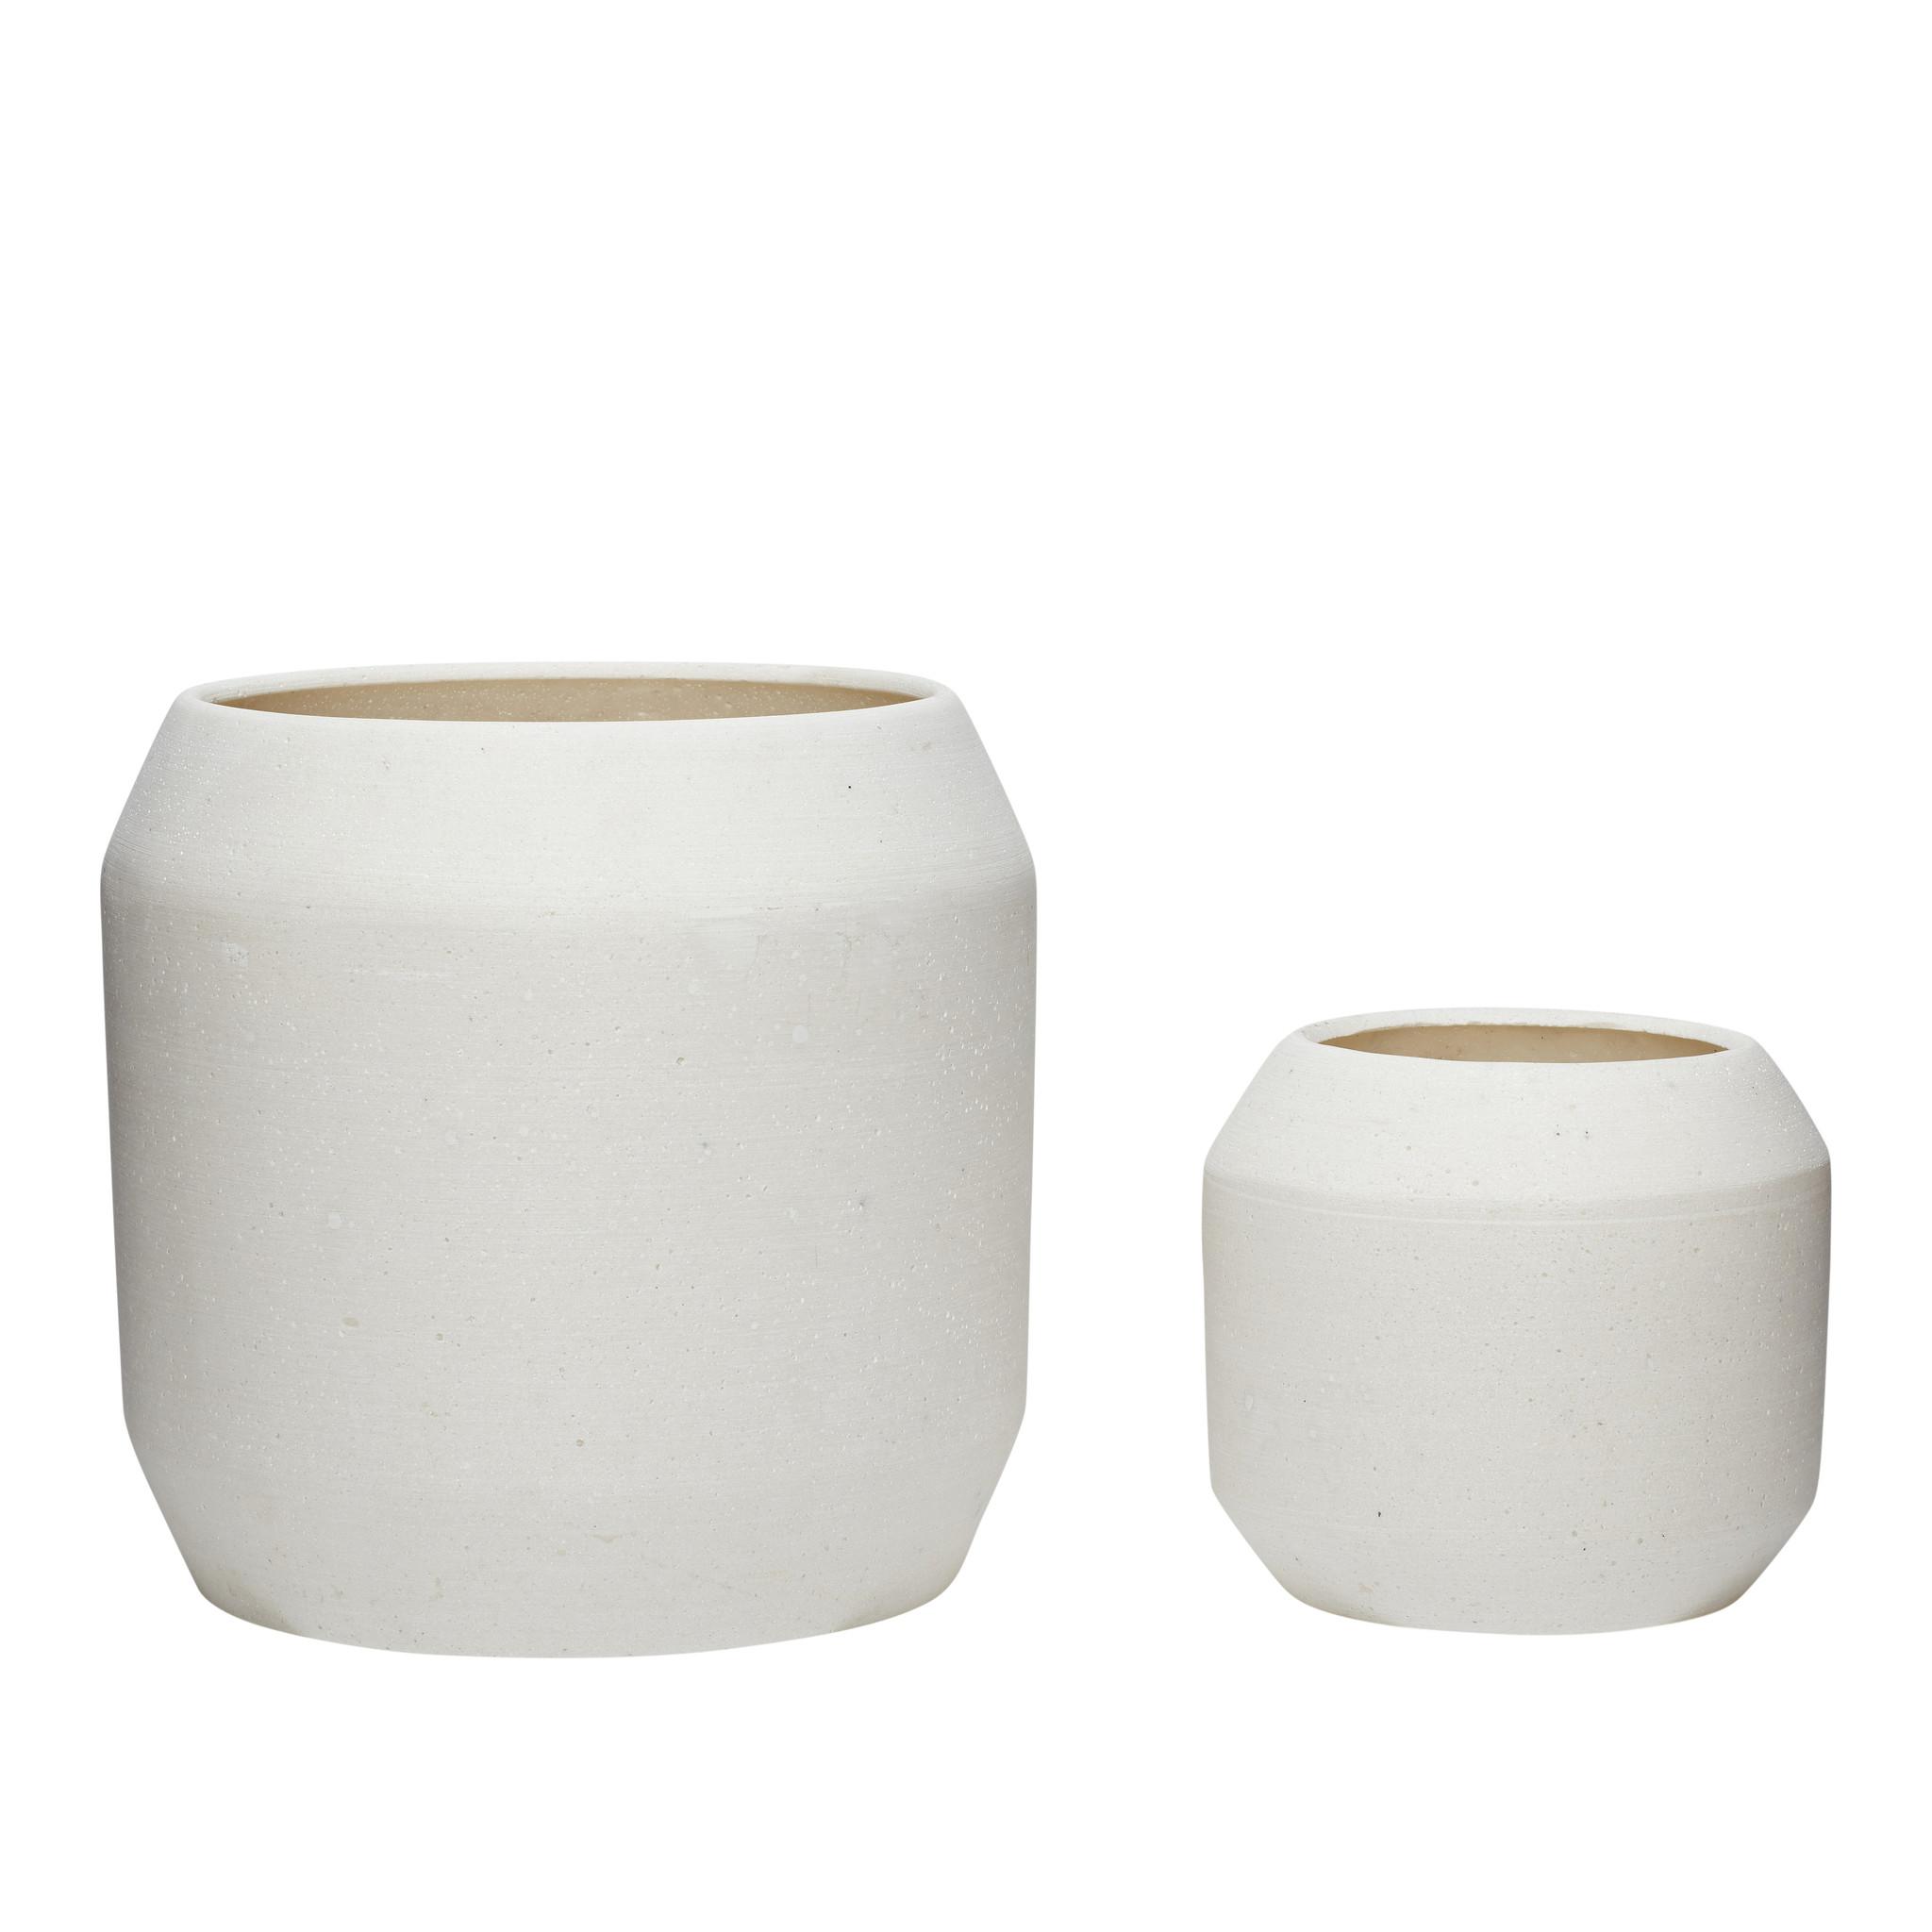 Hubsch Pot, keramiek, wit, set van 2-900502-5712772056349